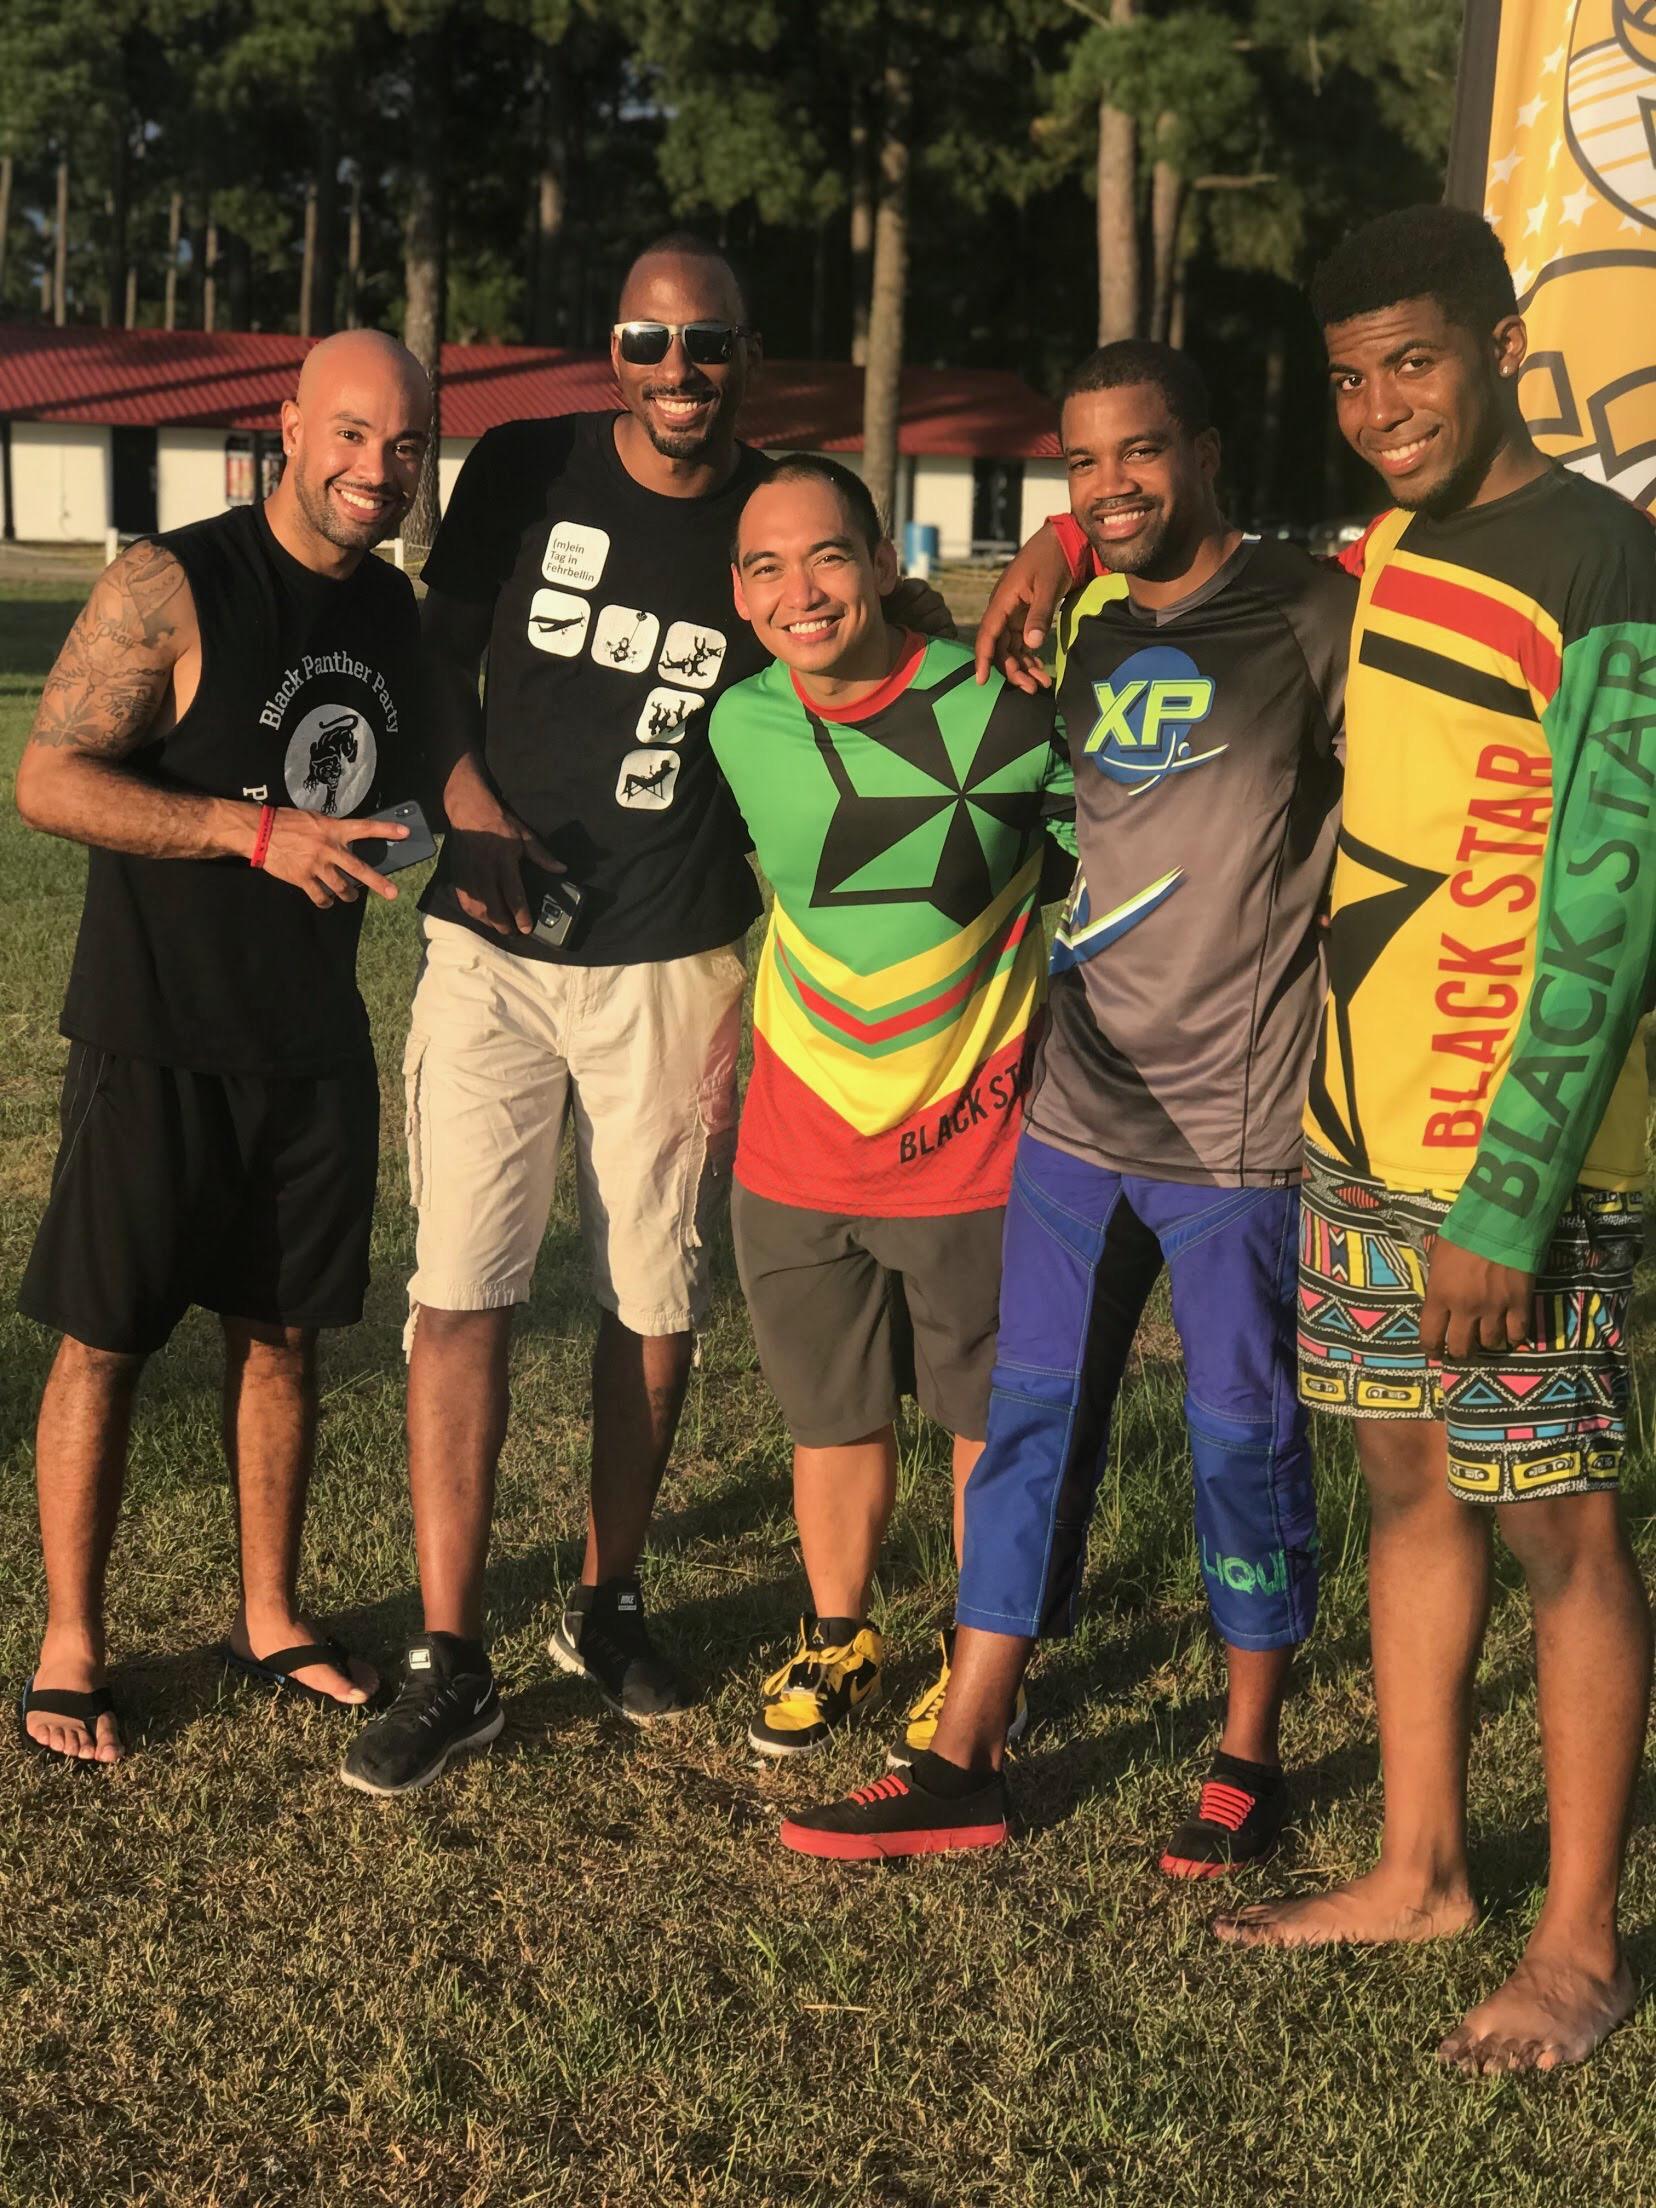 Group photo - TBS record jump - Matt Smith Nicholas Walker.JPG